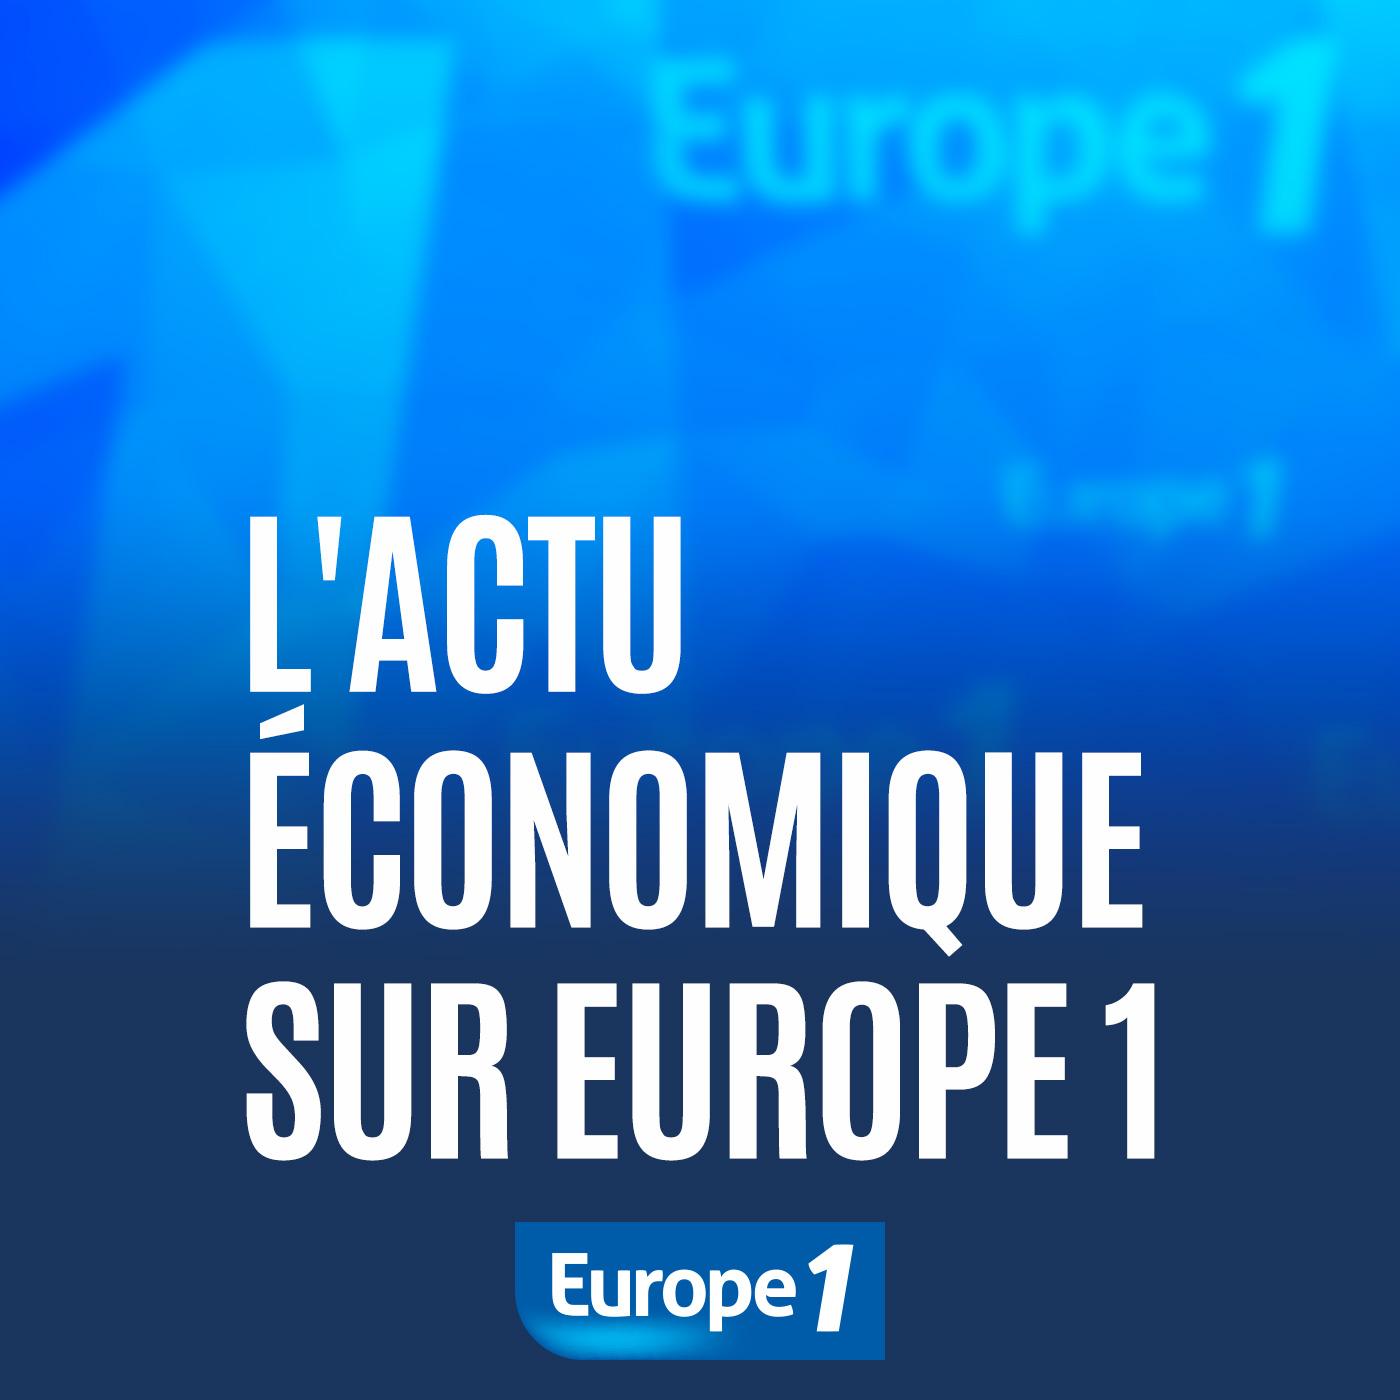 Image 1: L actu economique sur Europe 1